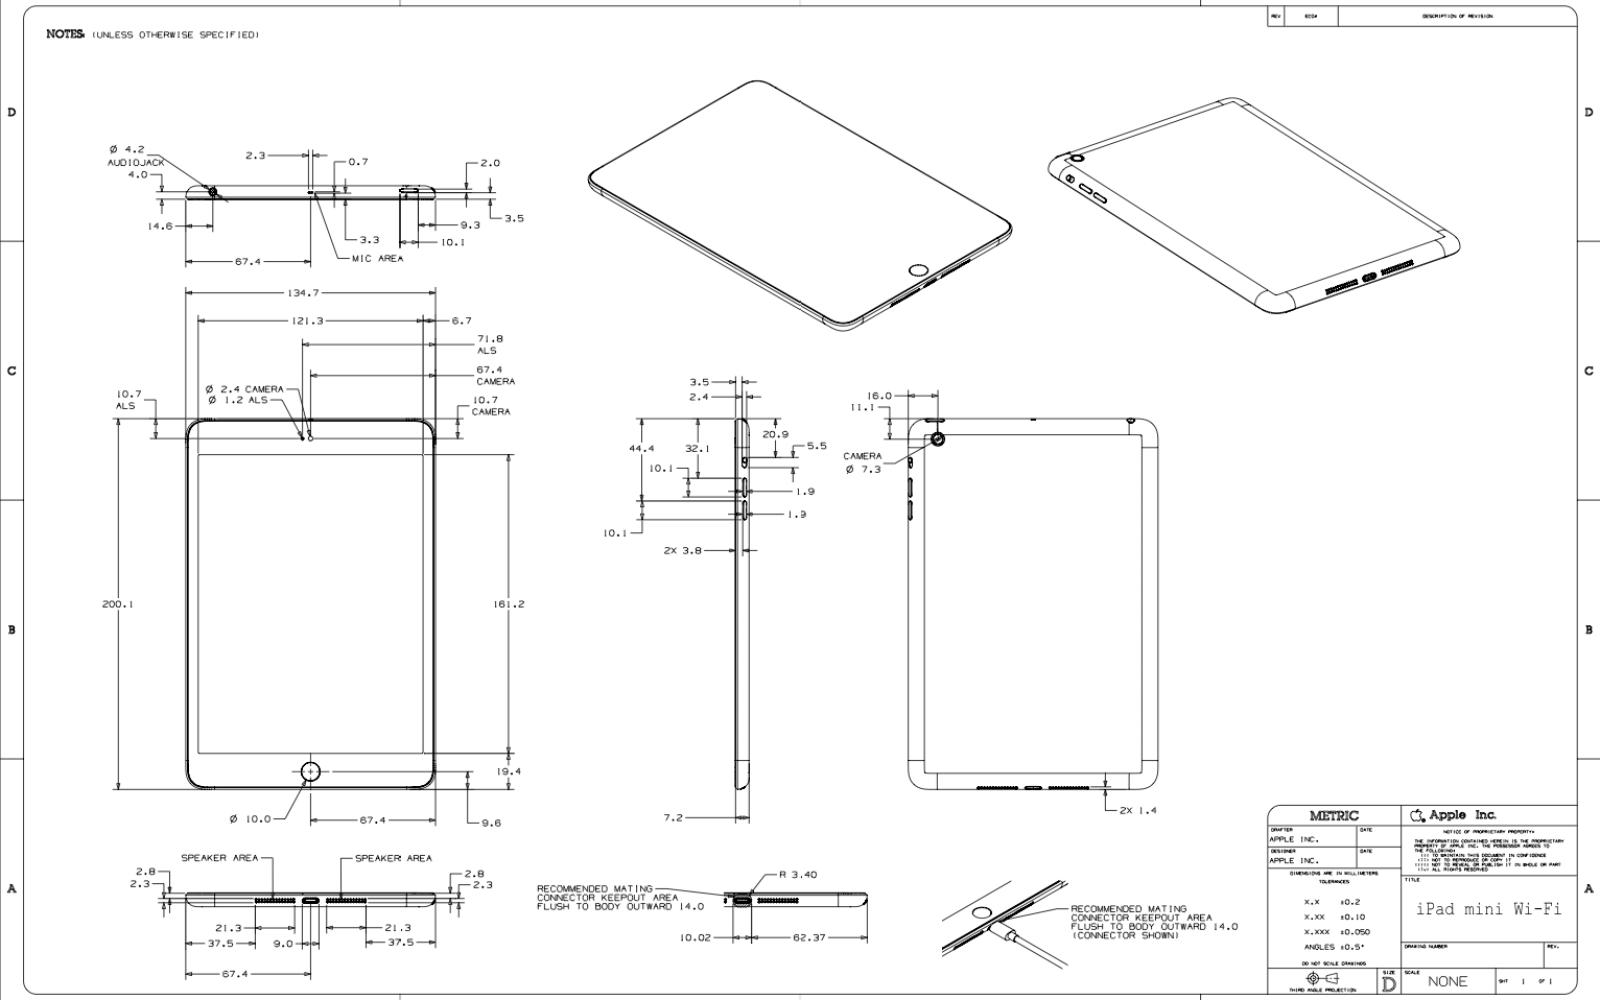 Full ipad mini and fourth generation ipad schematics blueprints now full ipad mini and fourth generation ipad schematics blueprints now on file malvernweather Images